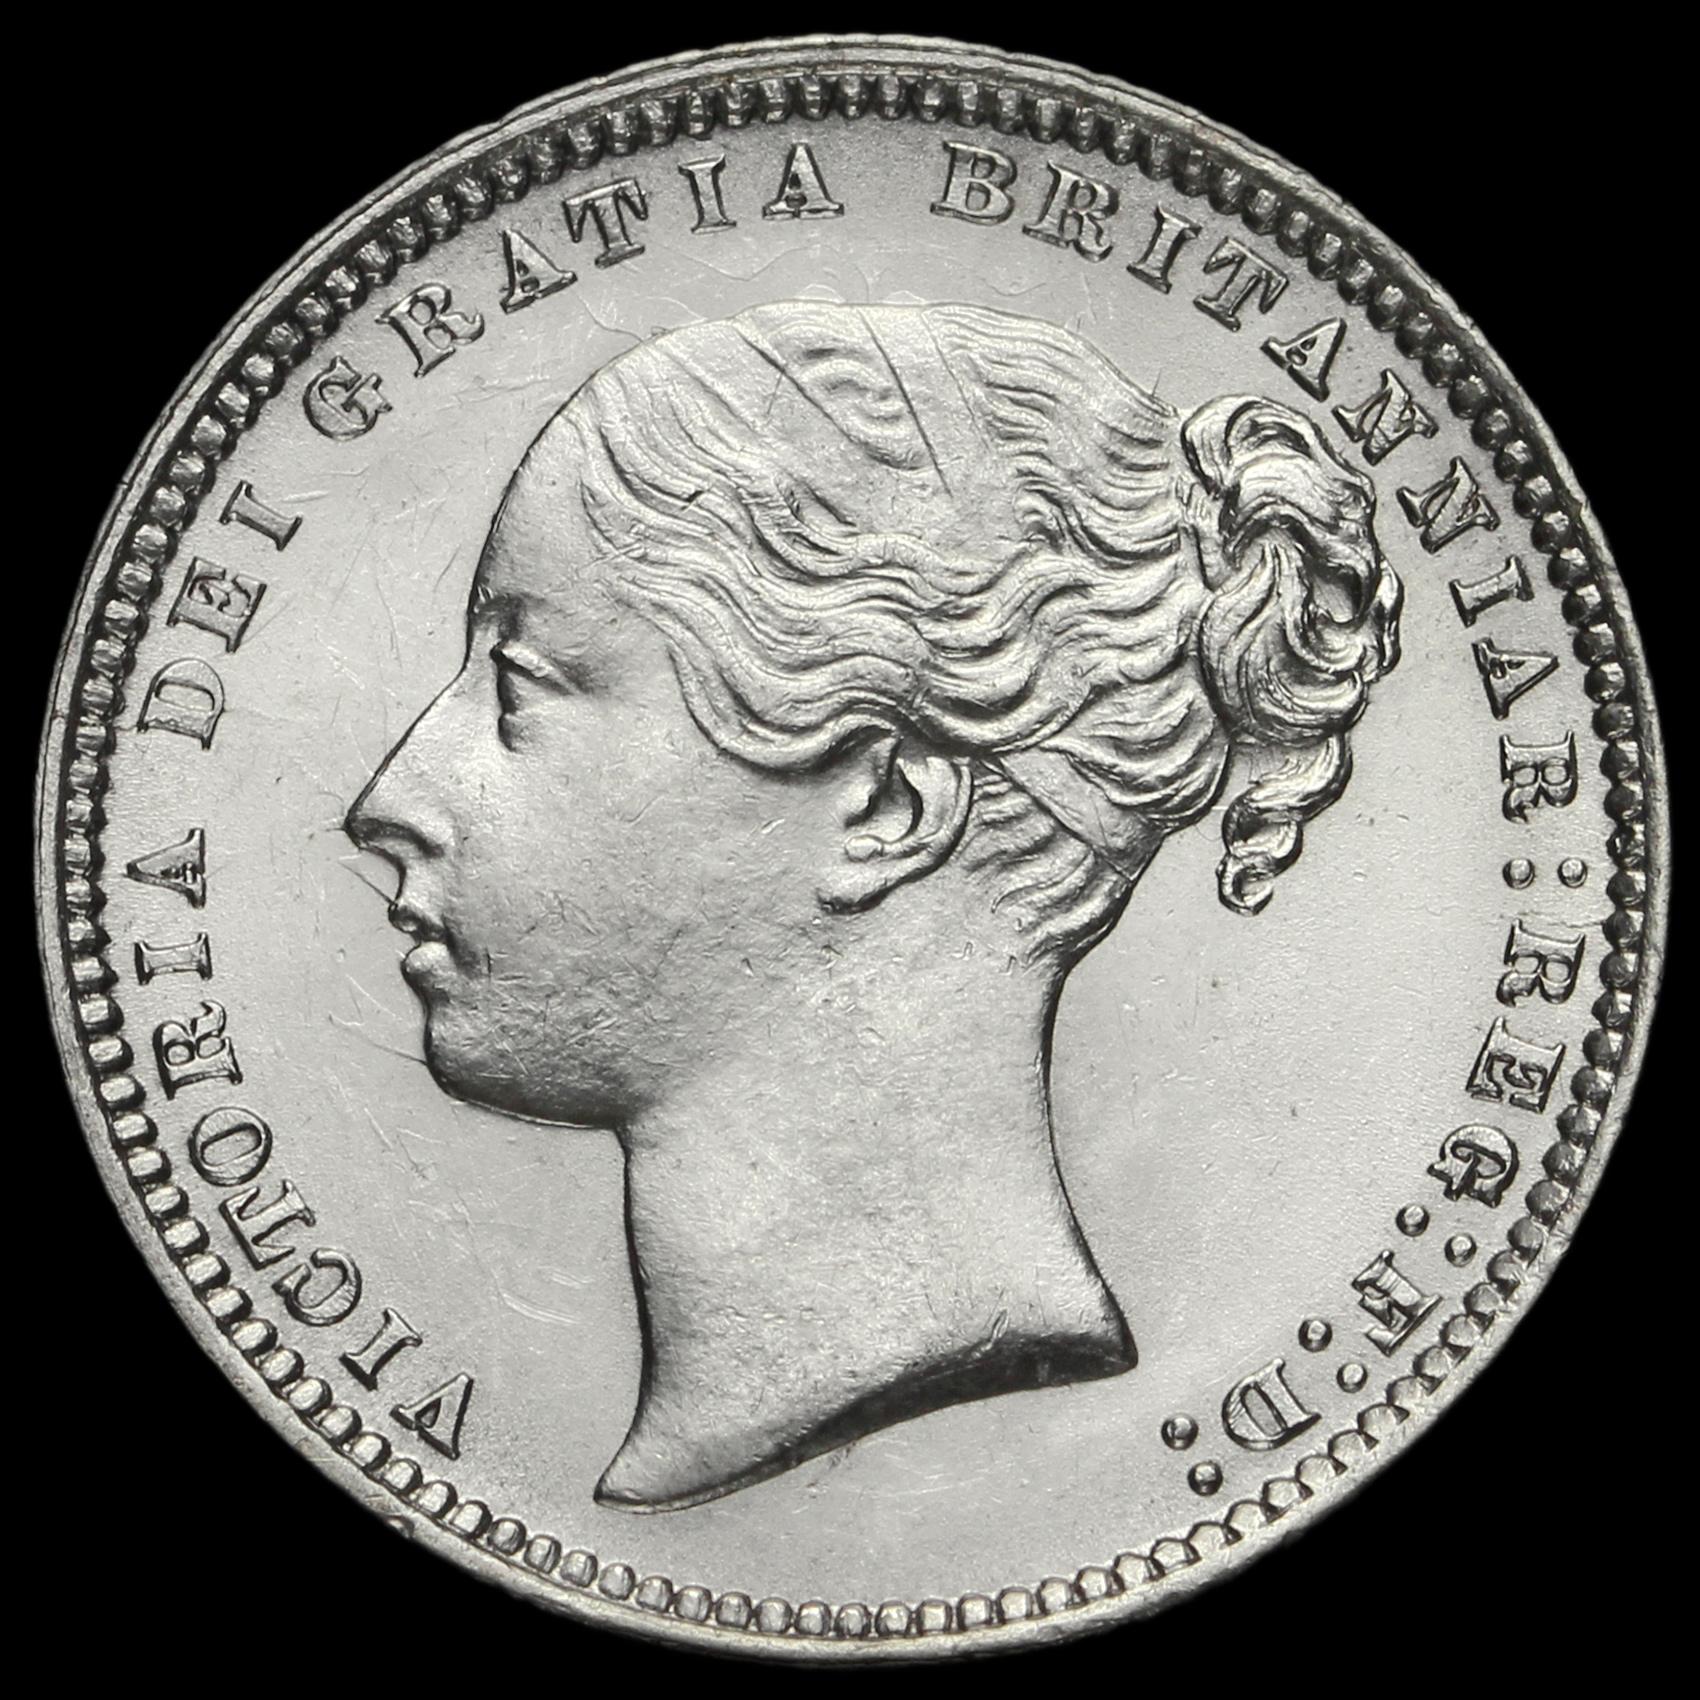 1868 Queen Victoria Young Head Silver Shilling, A/UNC